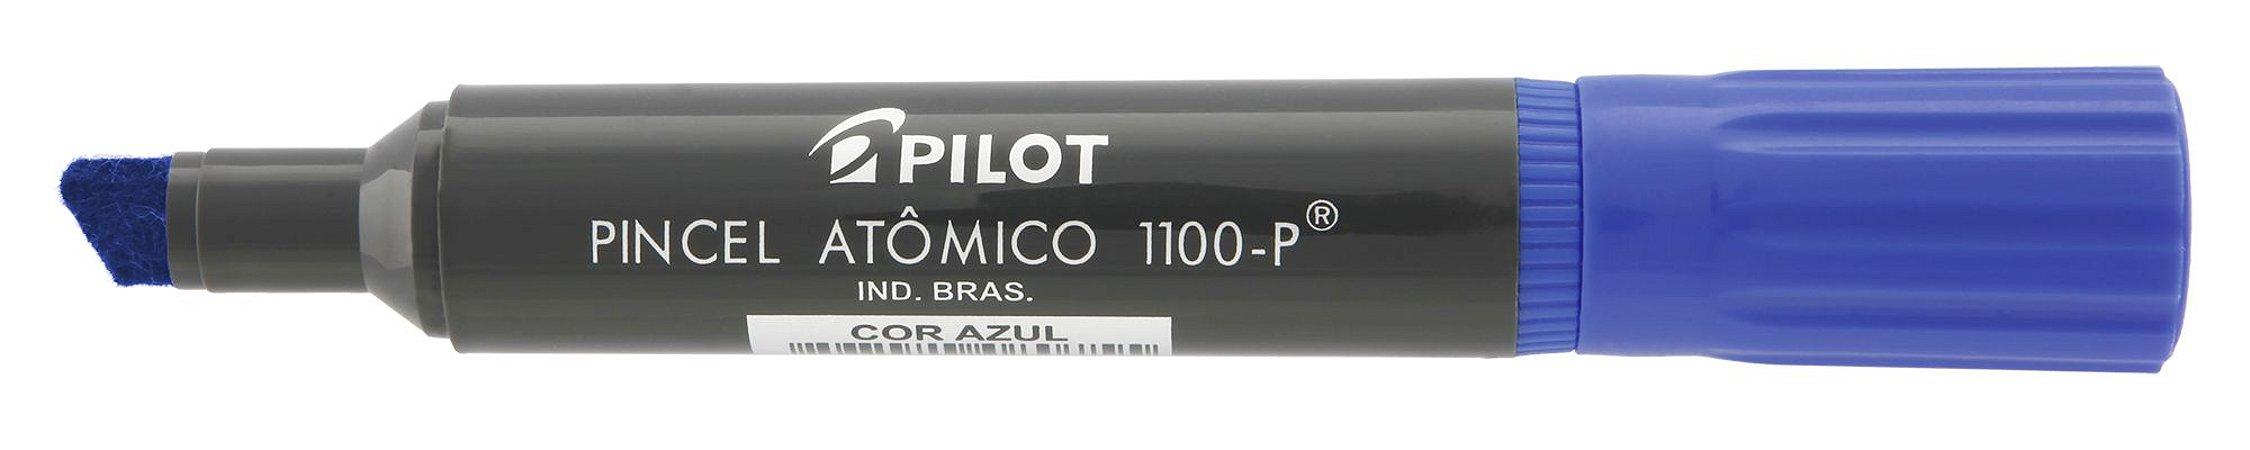 MARCADOR PINCEL ATÔMICO 1100-P AZUL - PILOT